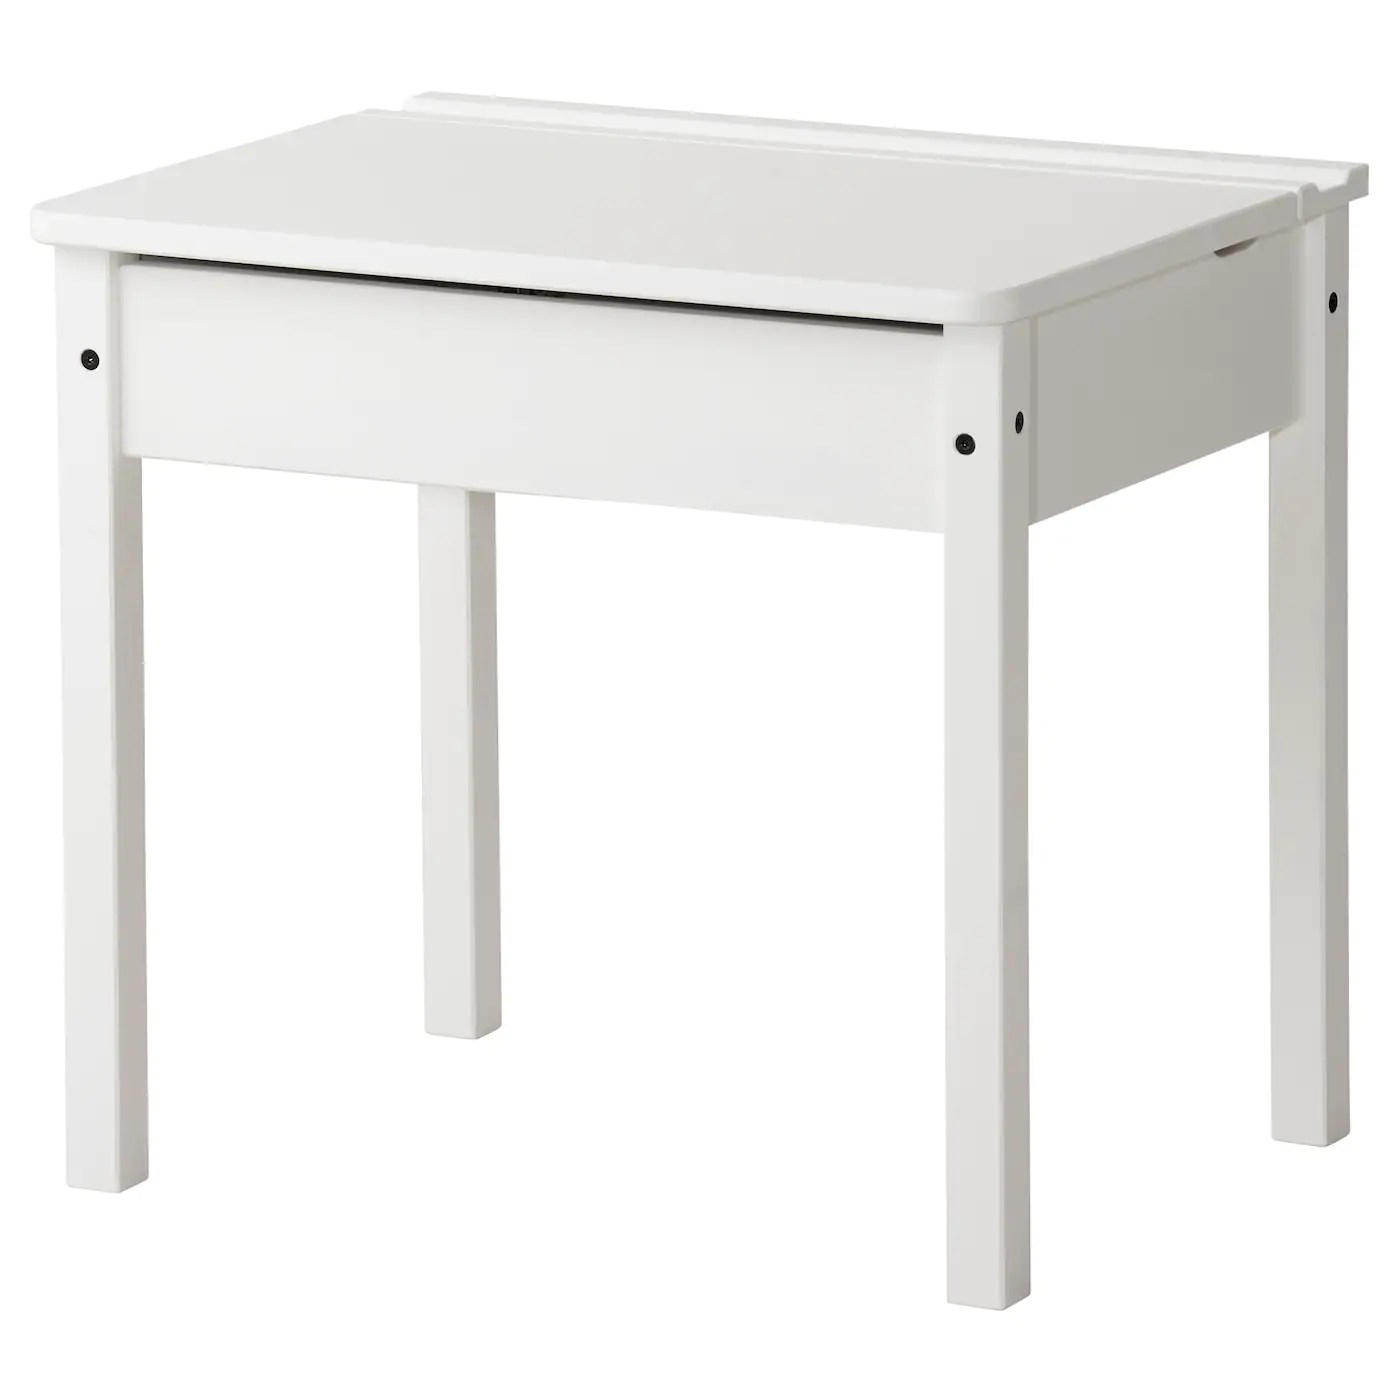 red childrens desk chair cesca replacement seats uk sundvik children 39s white 58 x 45 cm ikea